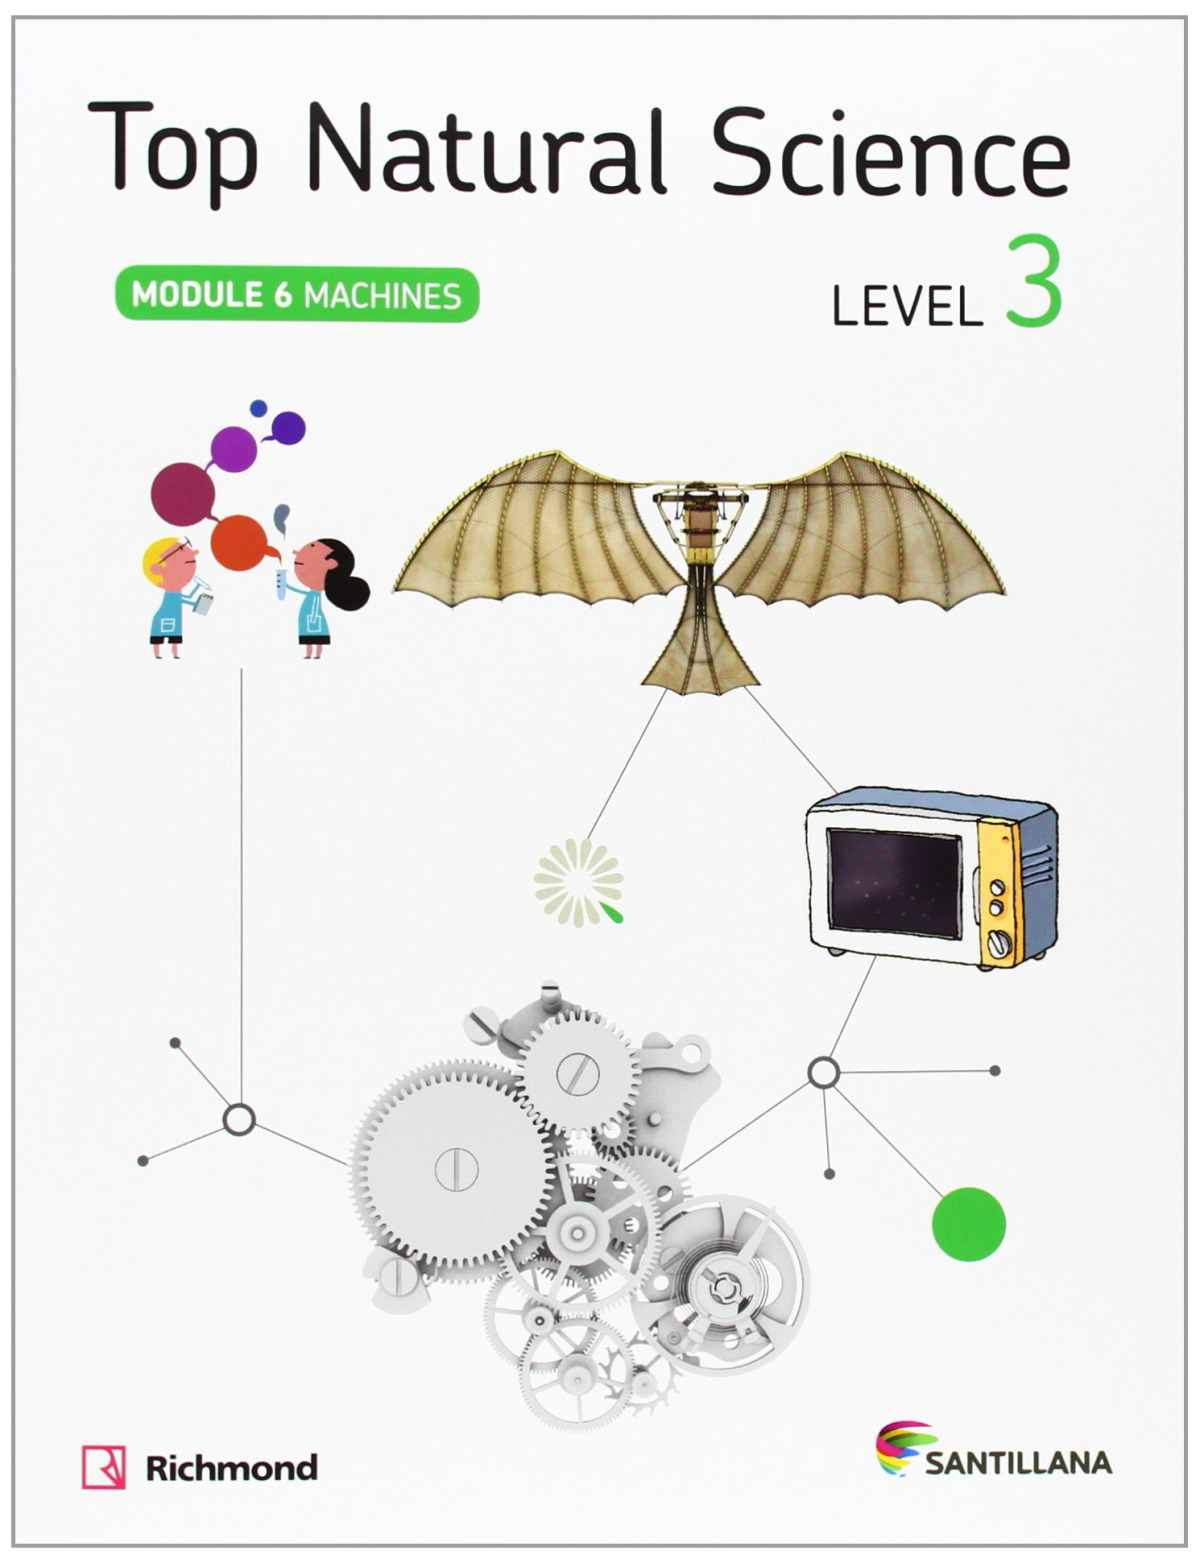 Top natural science 3. Machines